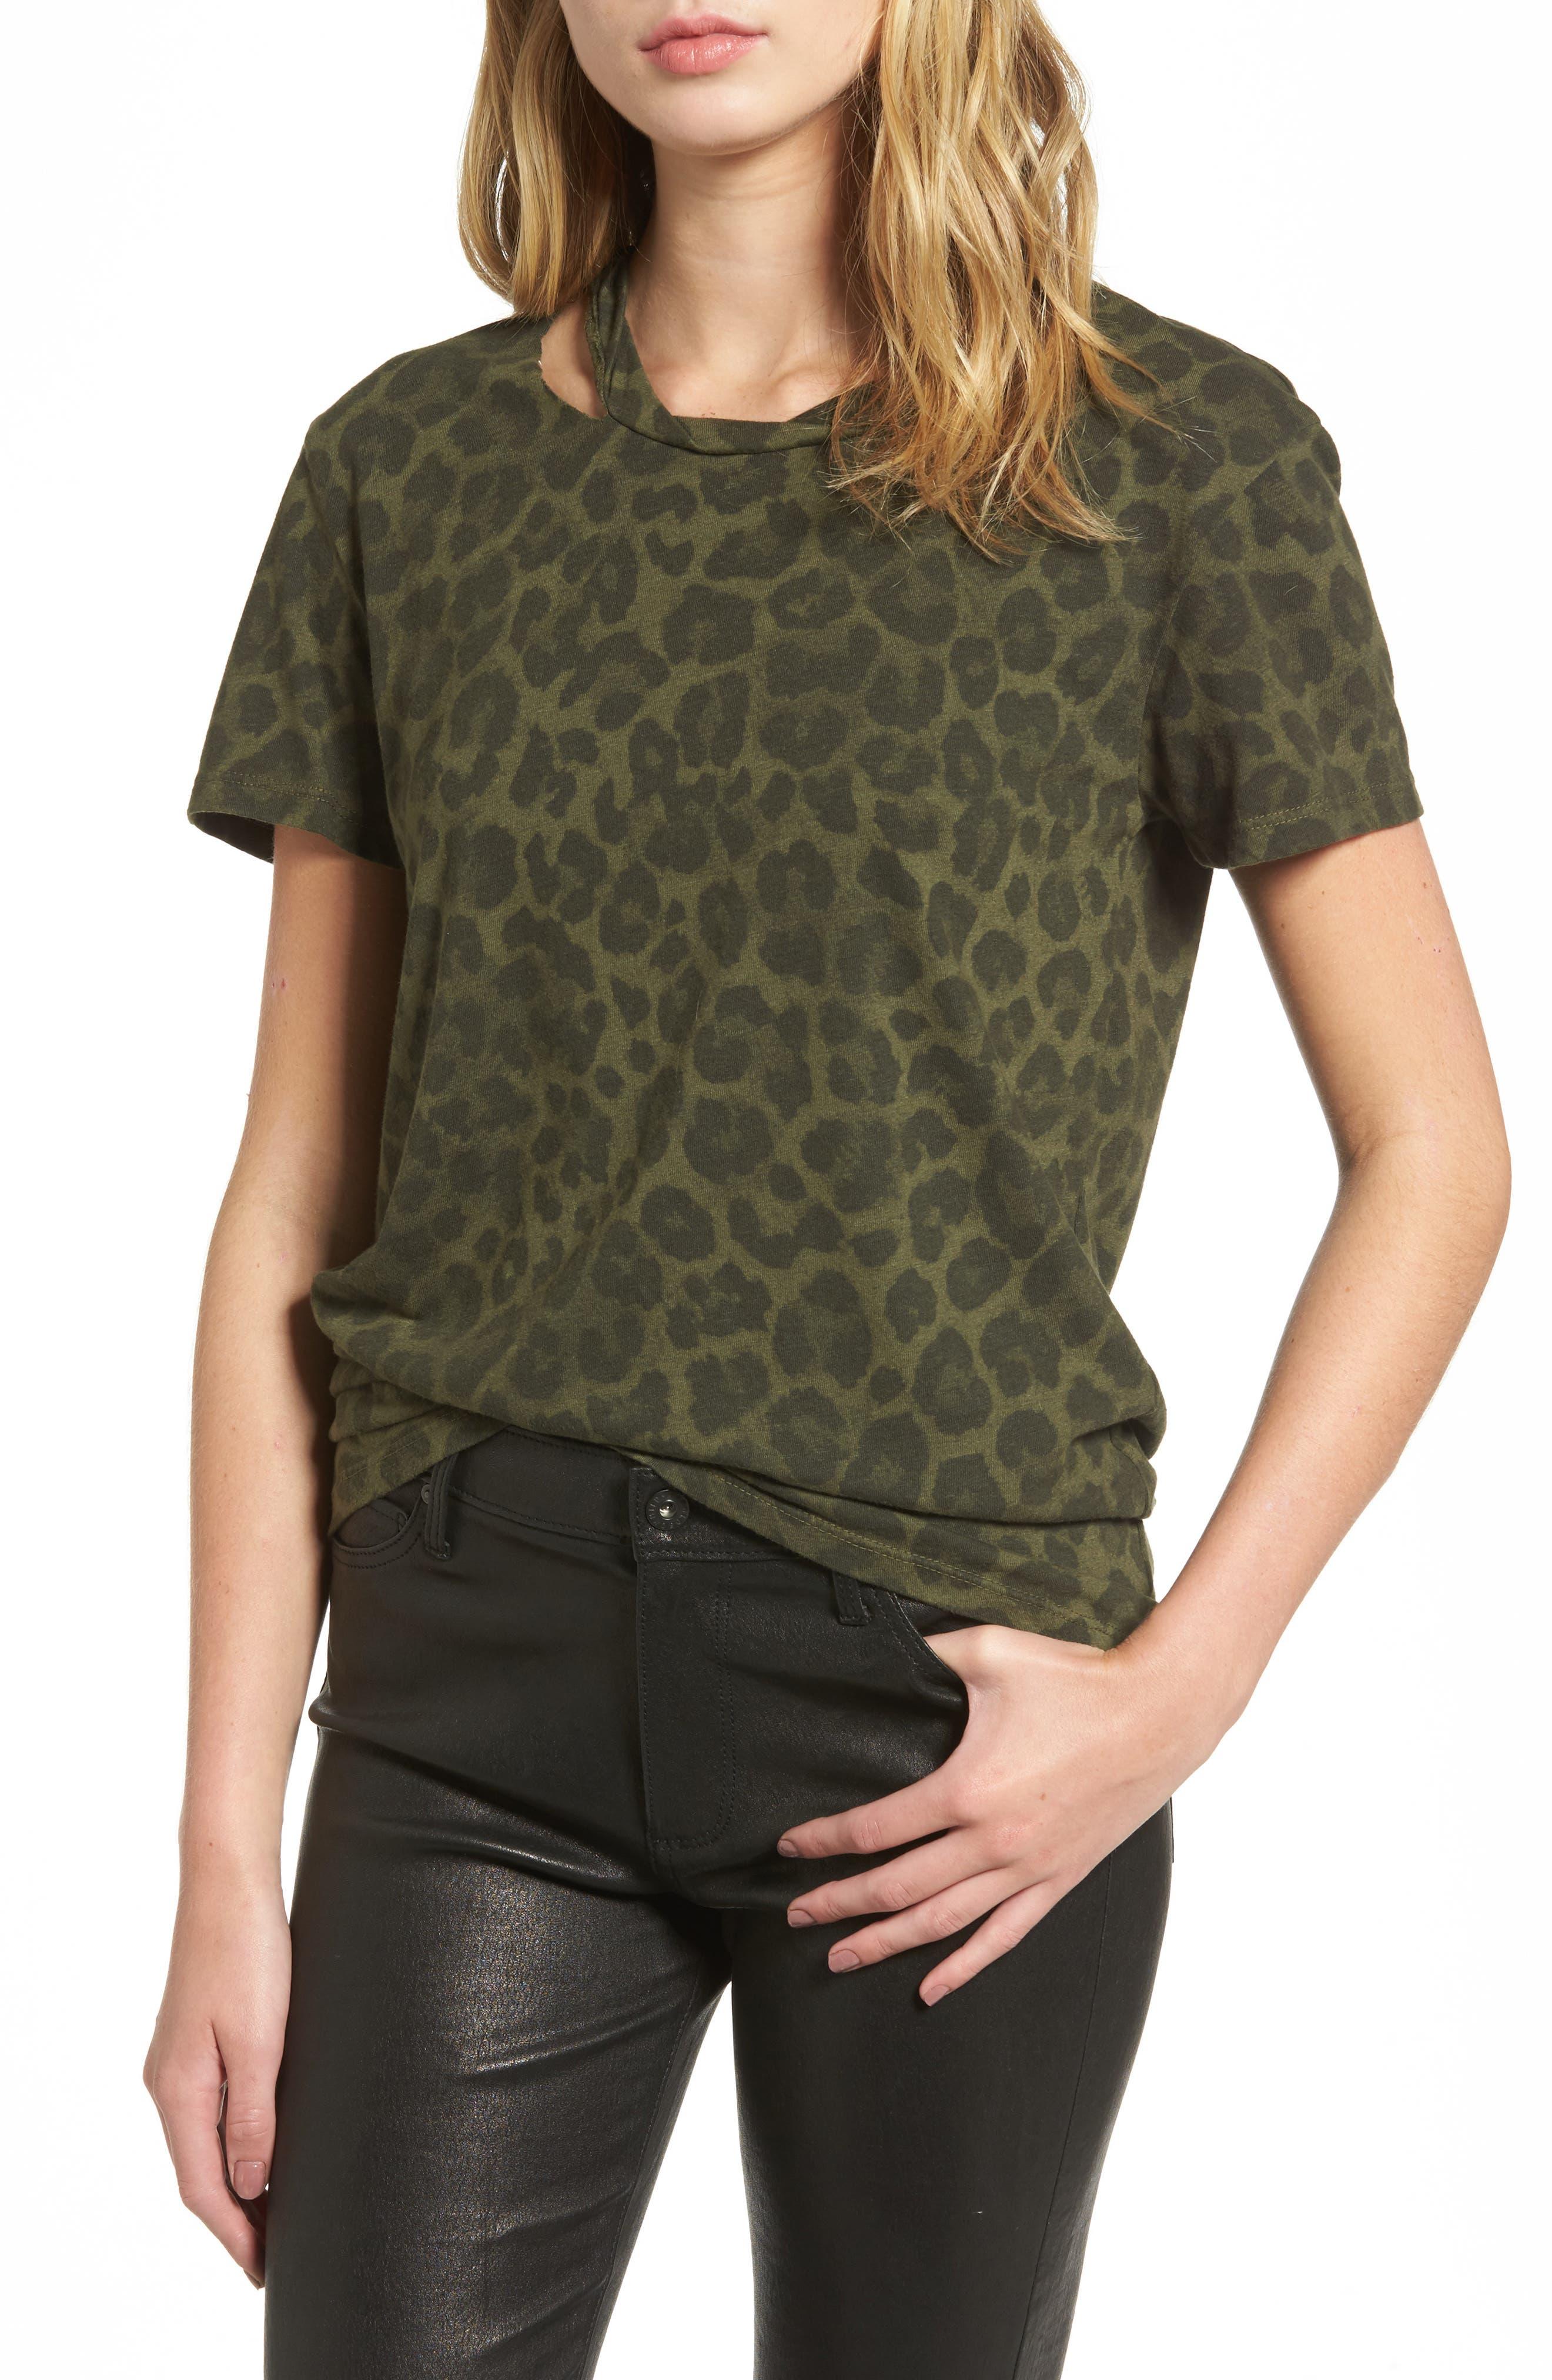 Main Image - Pam & Gela Leopard Print Tee